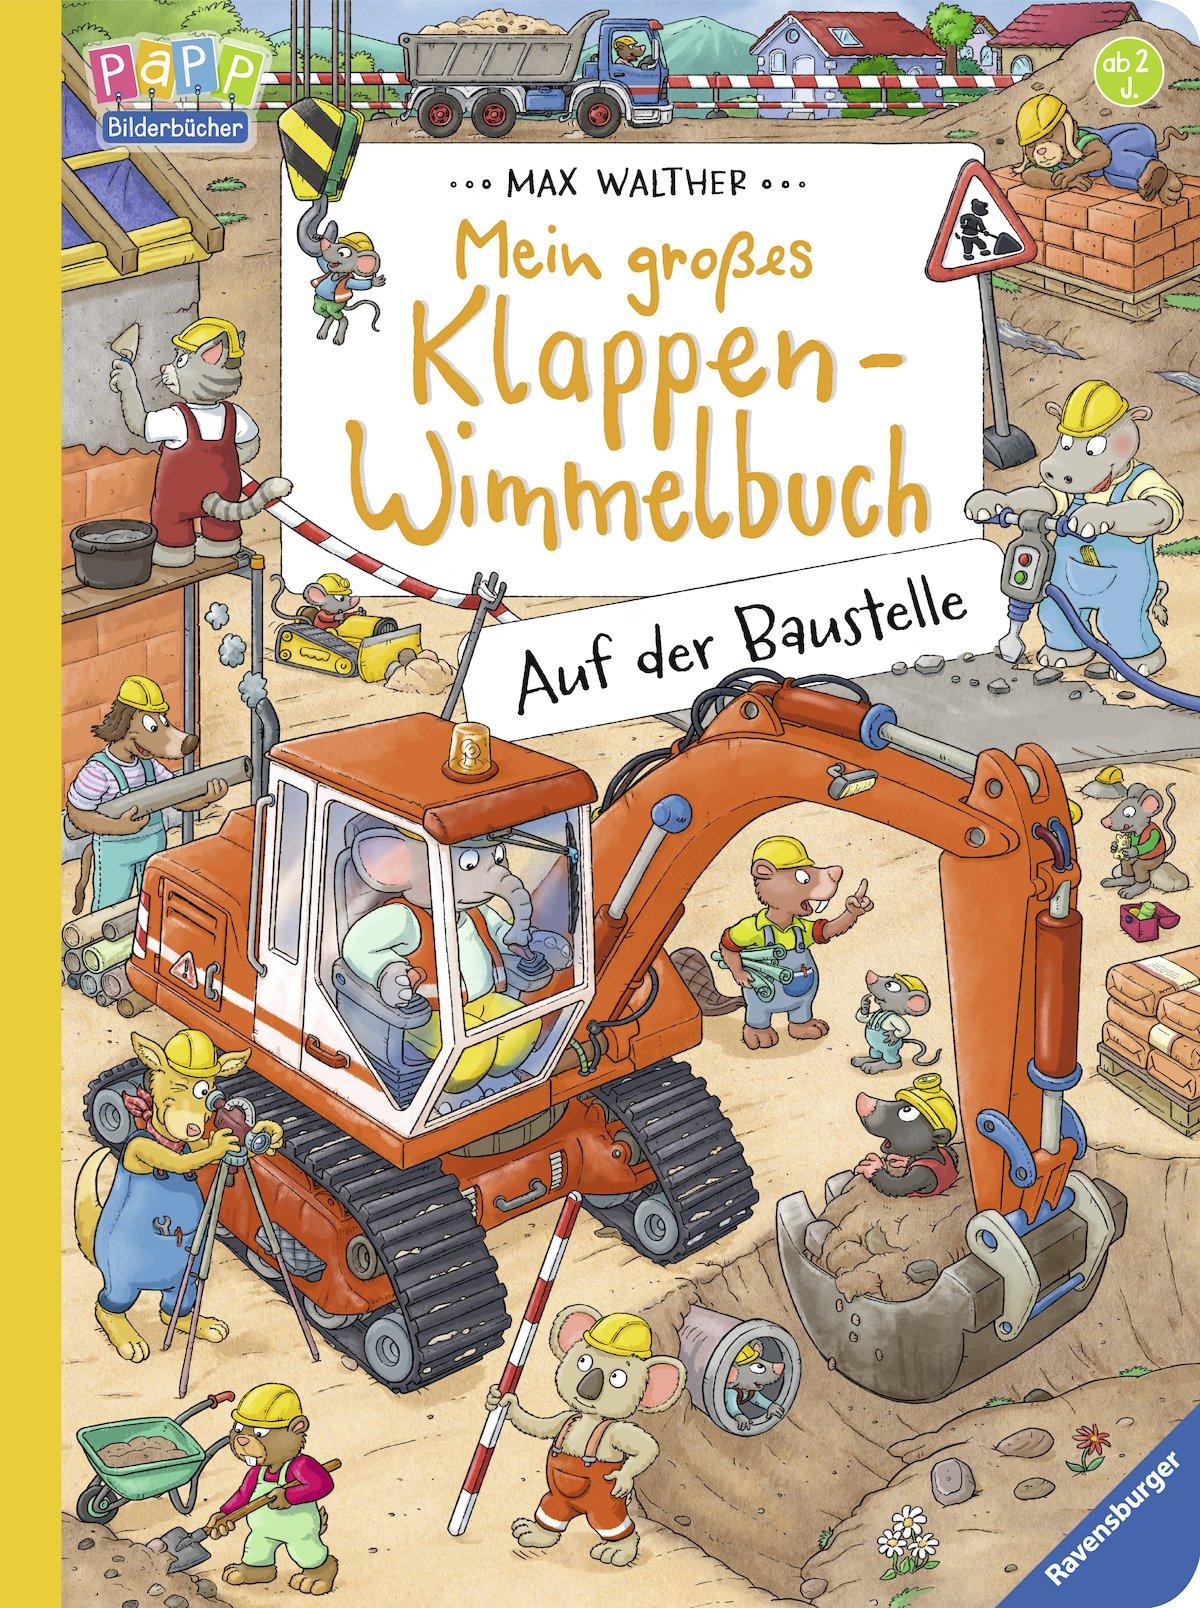 Baustelle haus comic  Mein großes Klappen-Wimmelbuch: Auf der Baustelle: Amazon.de: Max ...